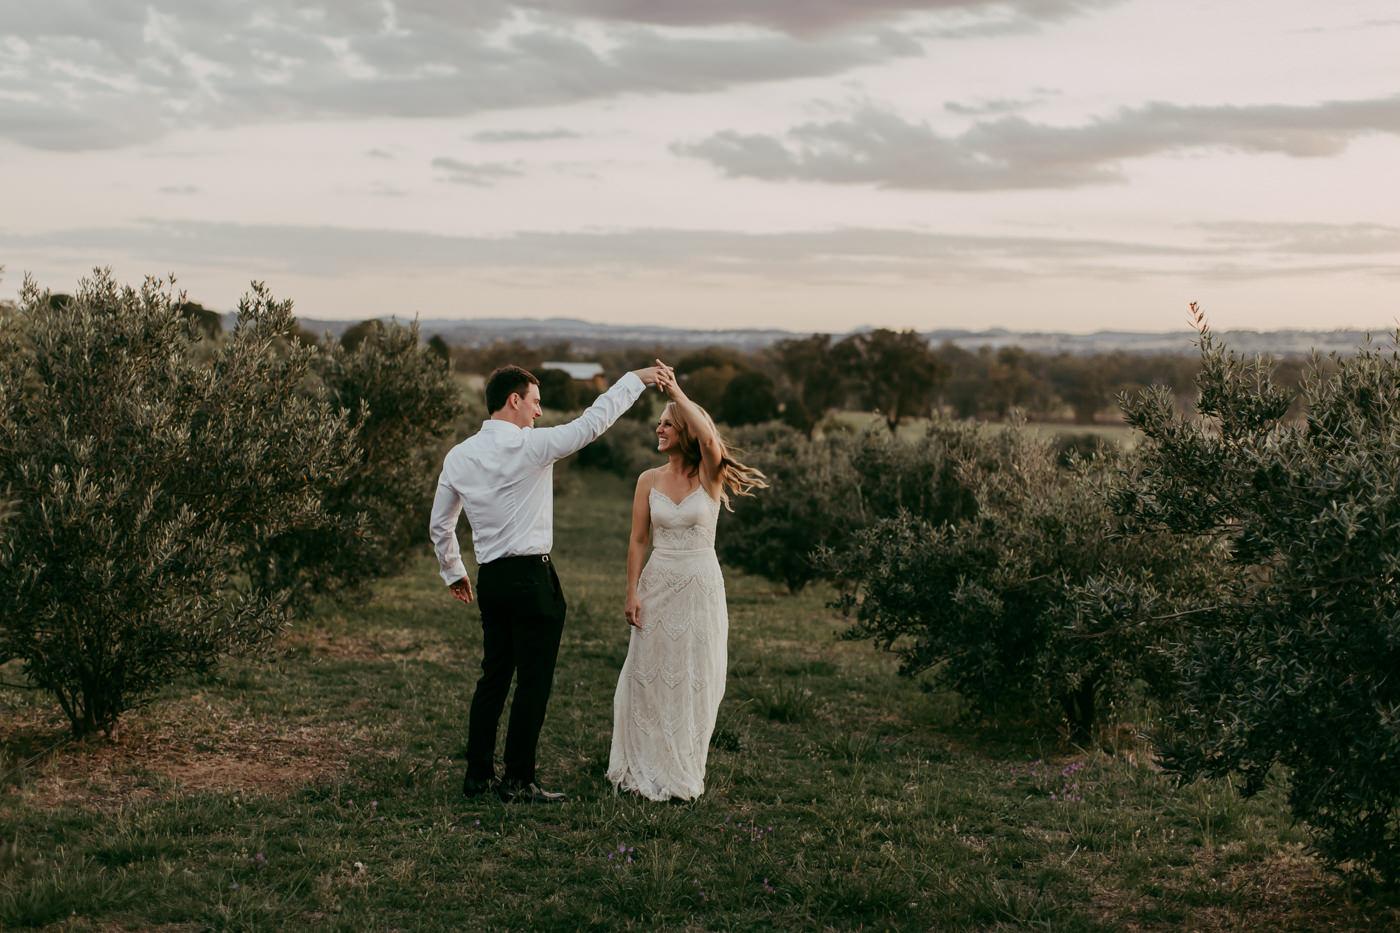 Anthony & Eliet - Wagga Wagga Wedding - Country NSW - Samantha Heather Photography-163.jpg